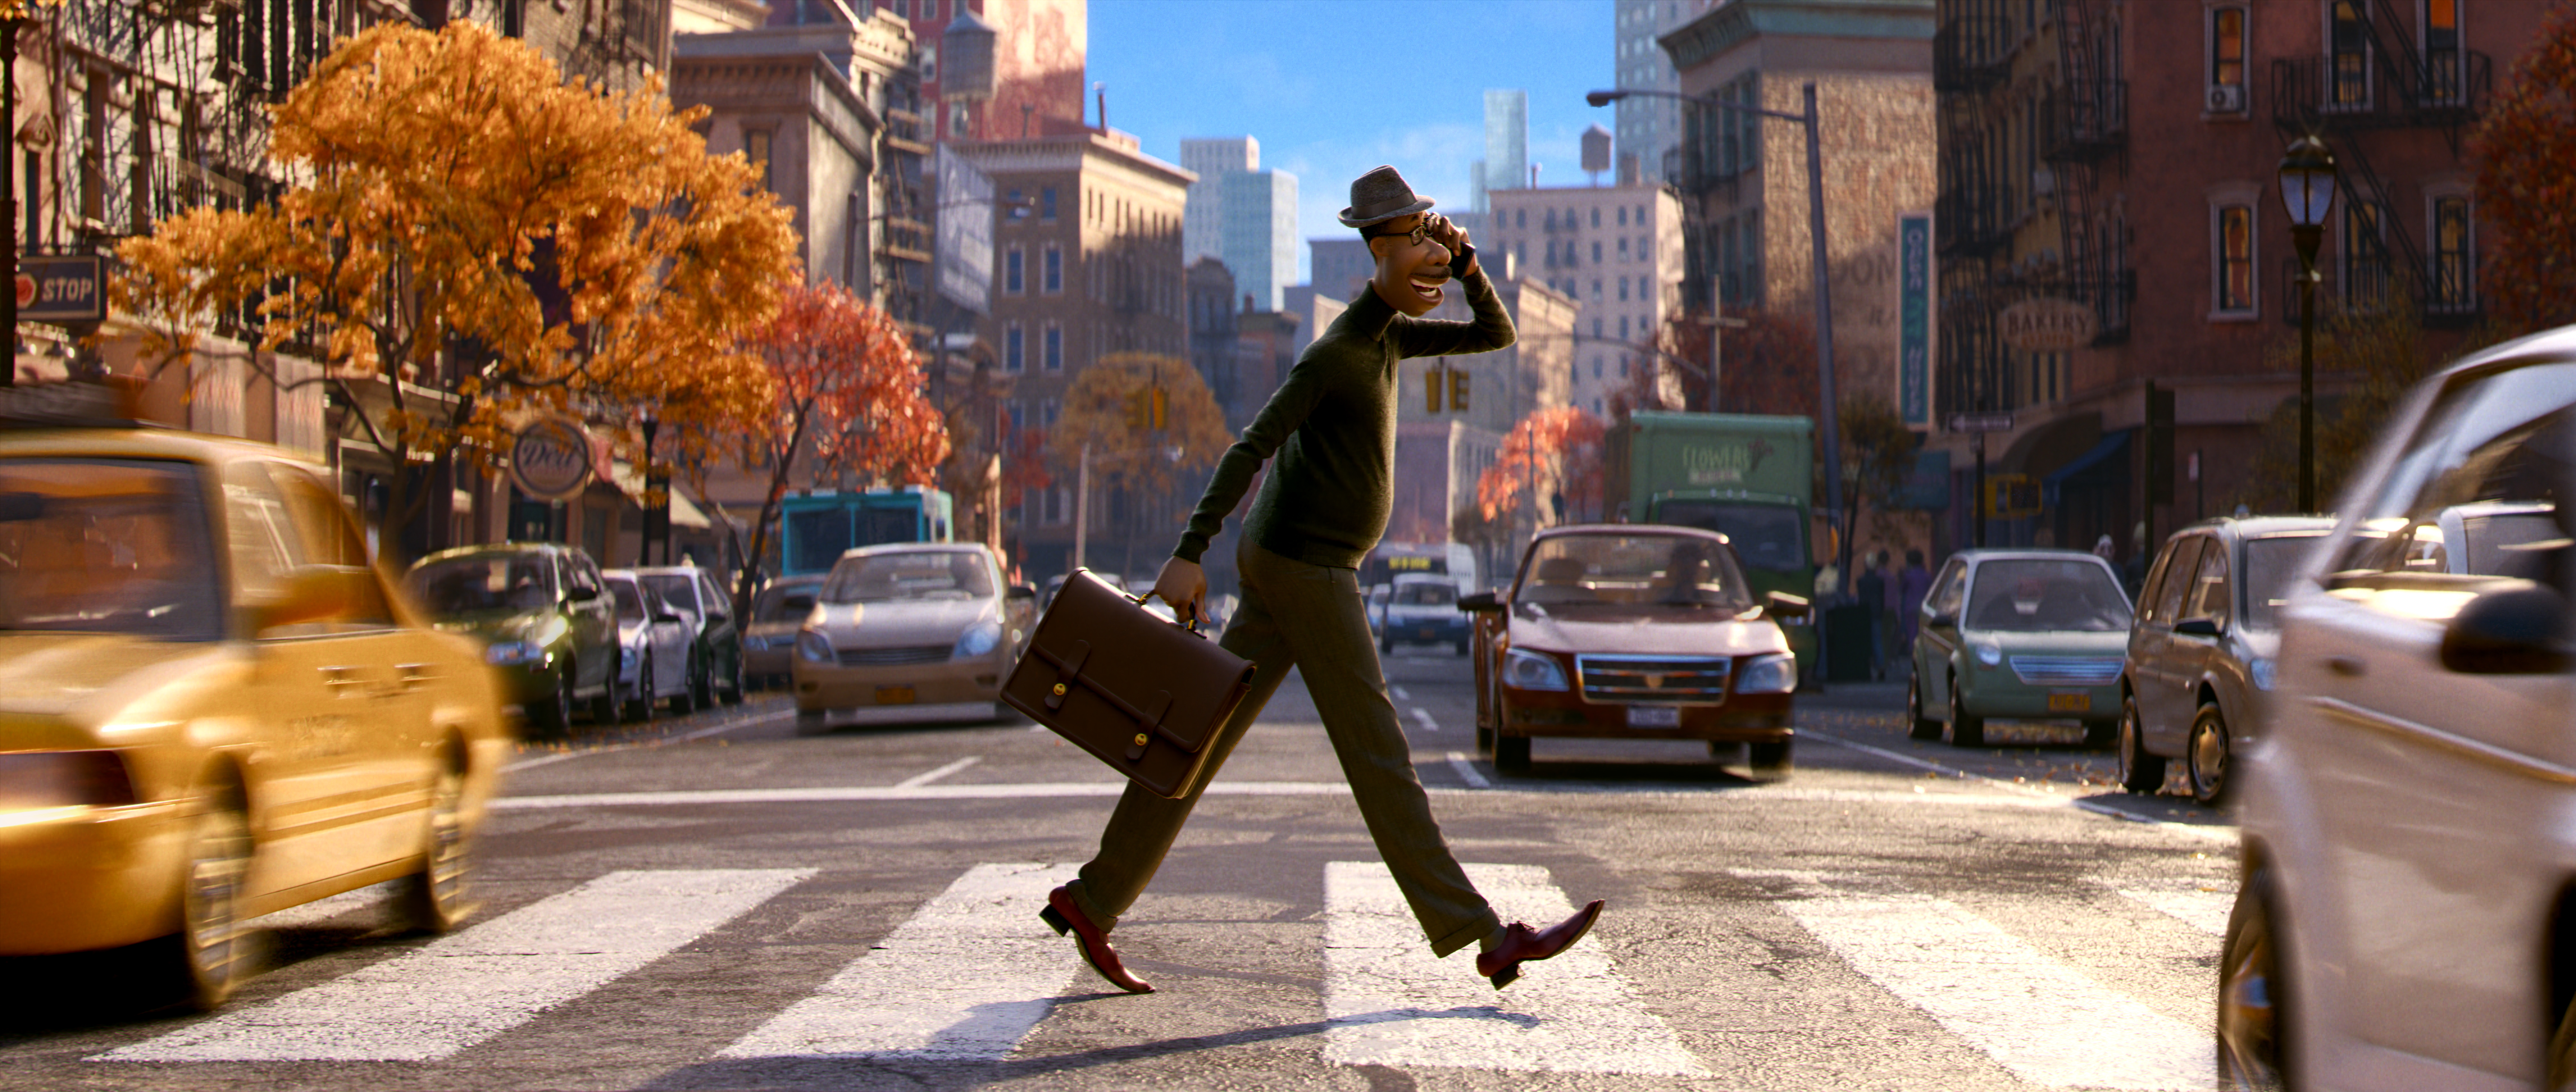 [News] Trailer Release for Pixar's SOUL